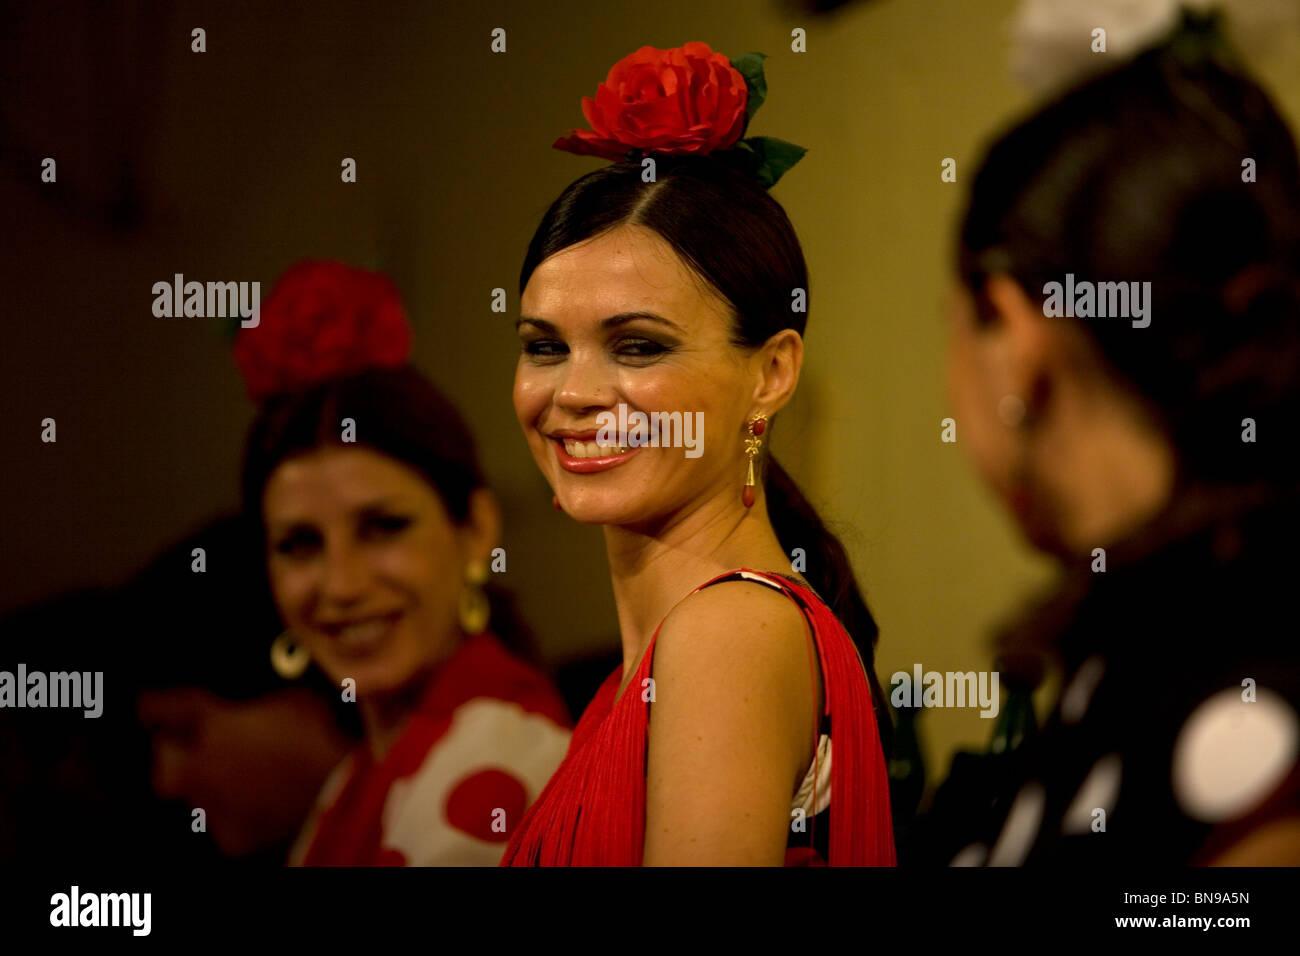 A Flamenco dancer, or bailaora, smiles during a performance in the Tablao Flamenco El Cardenal in Cordoba, Andalusia, - Stock Image